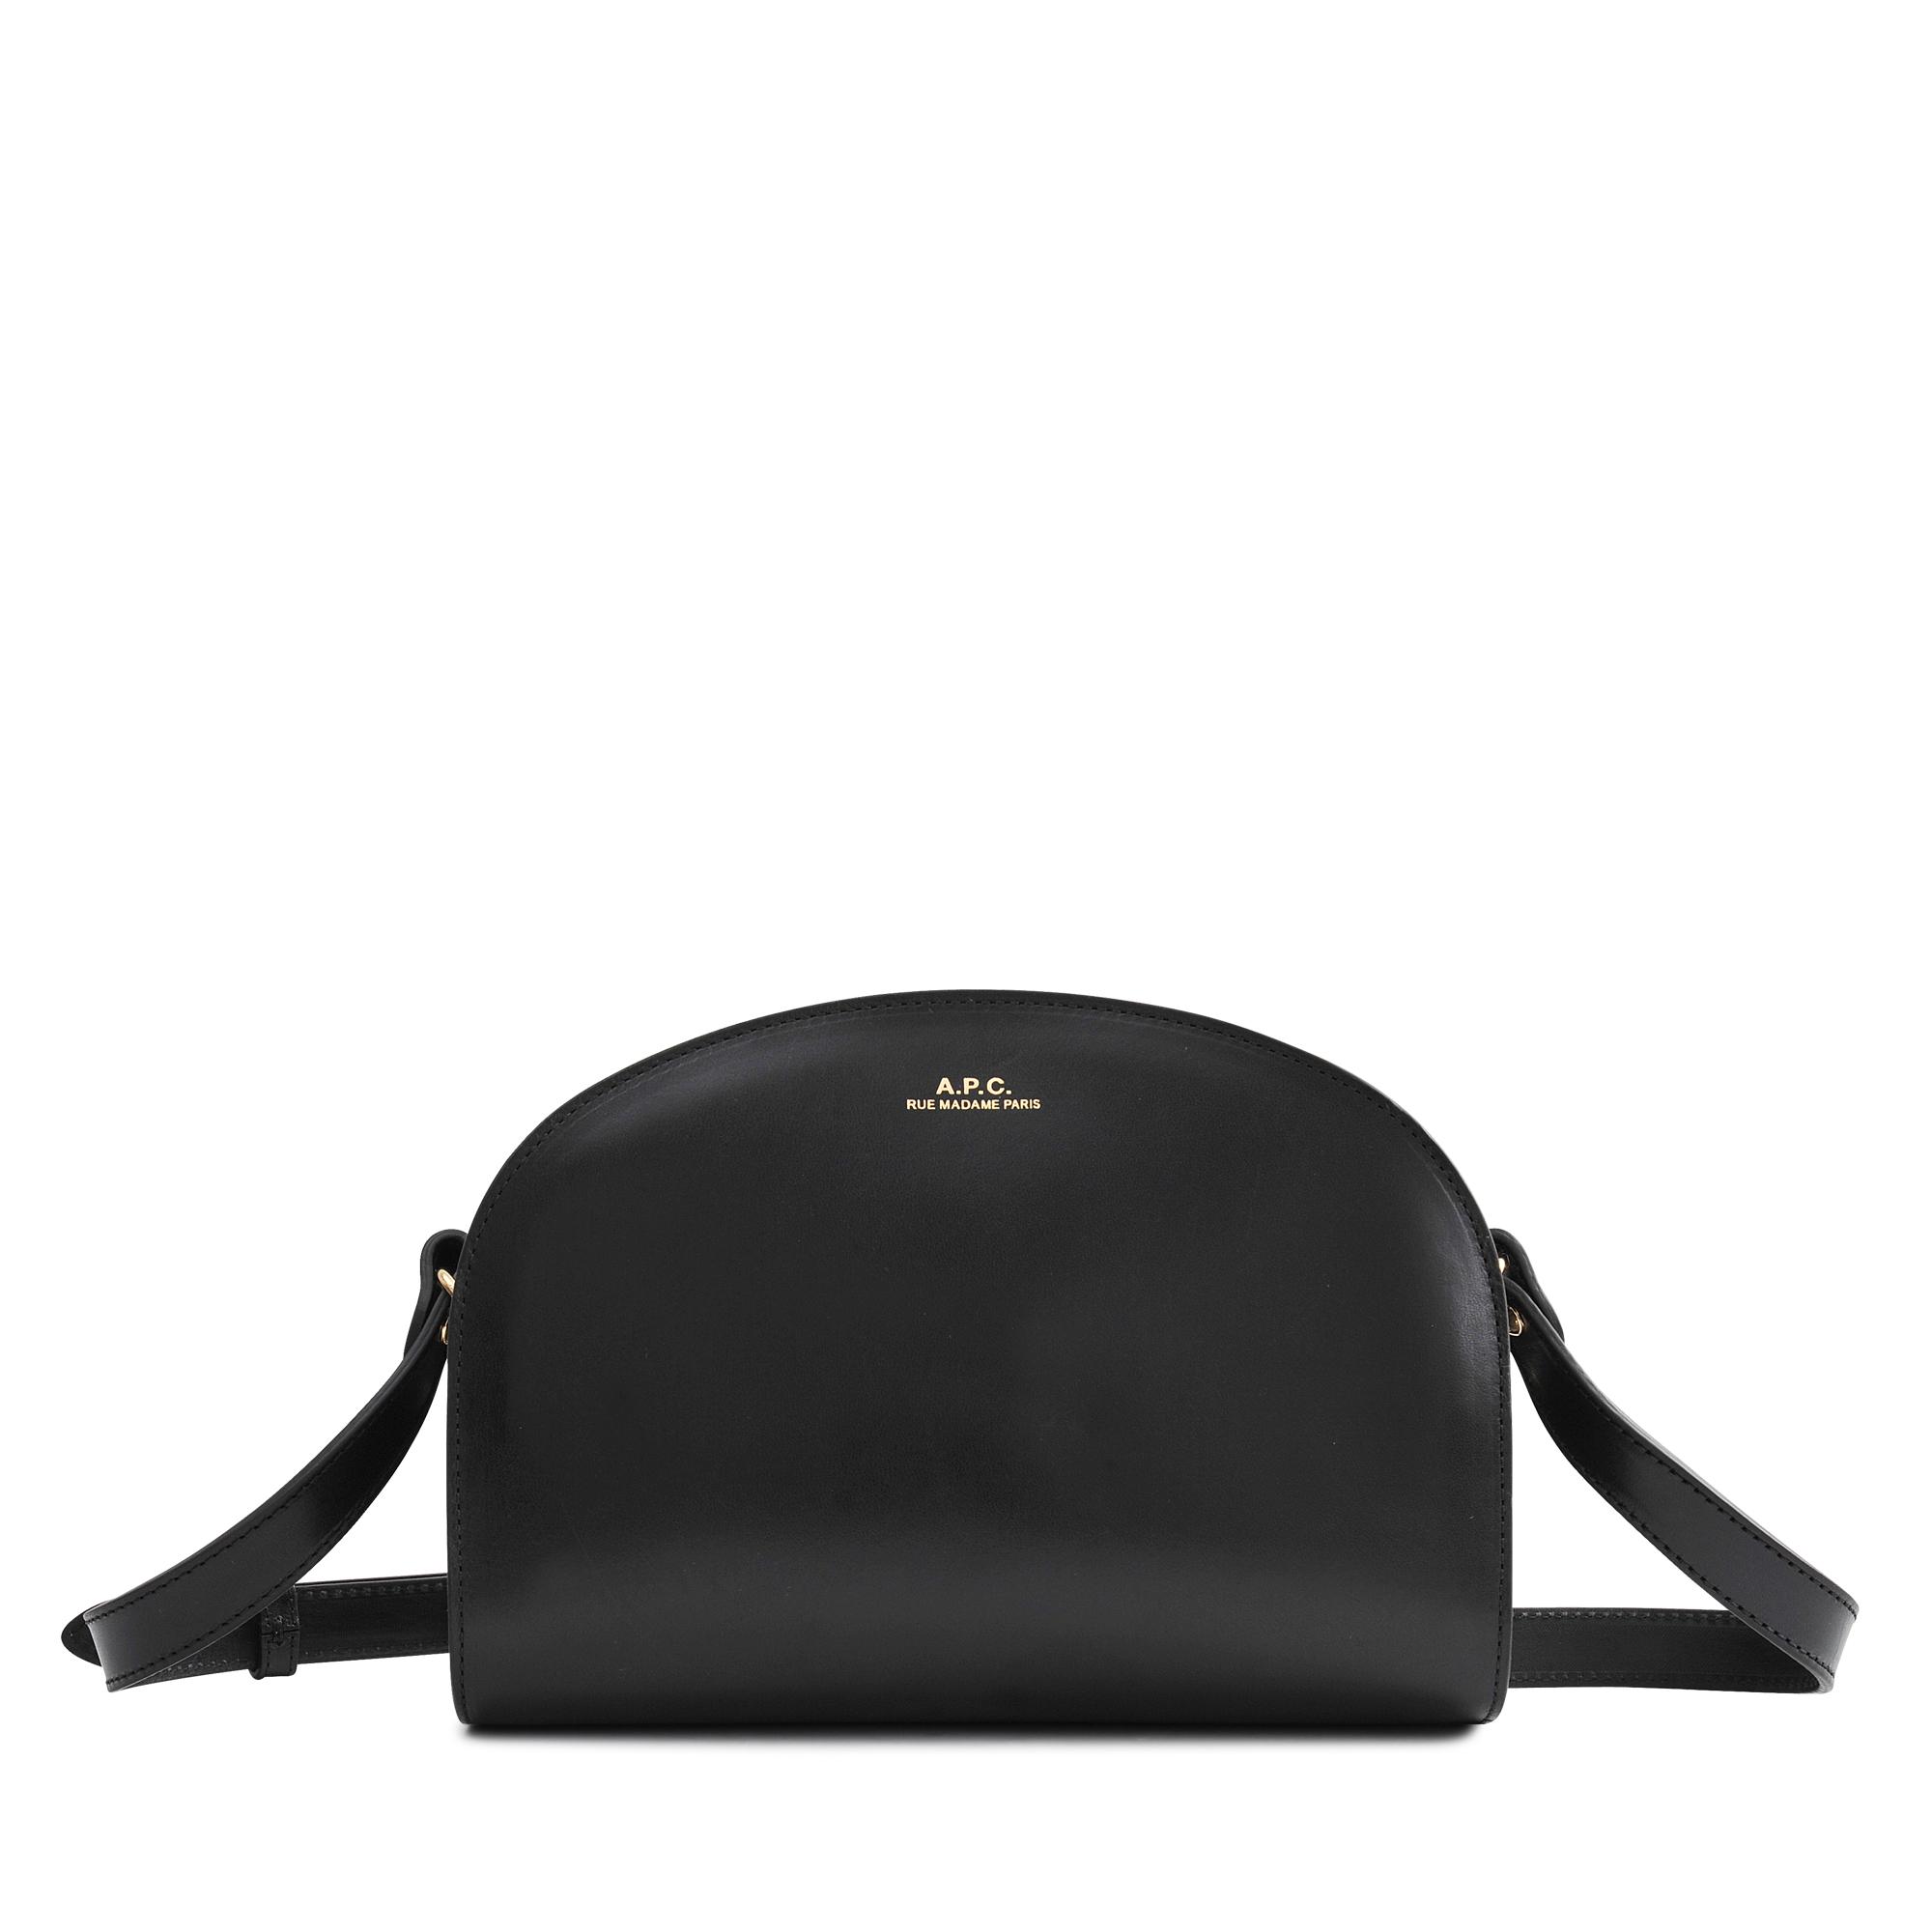 a p c half moon bag in black lyst. Black Bedroom Furniture Sets. Home Design Ideas